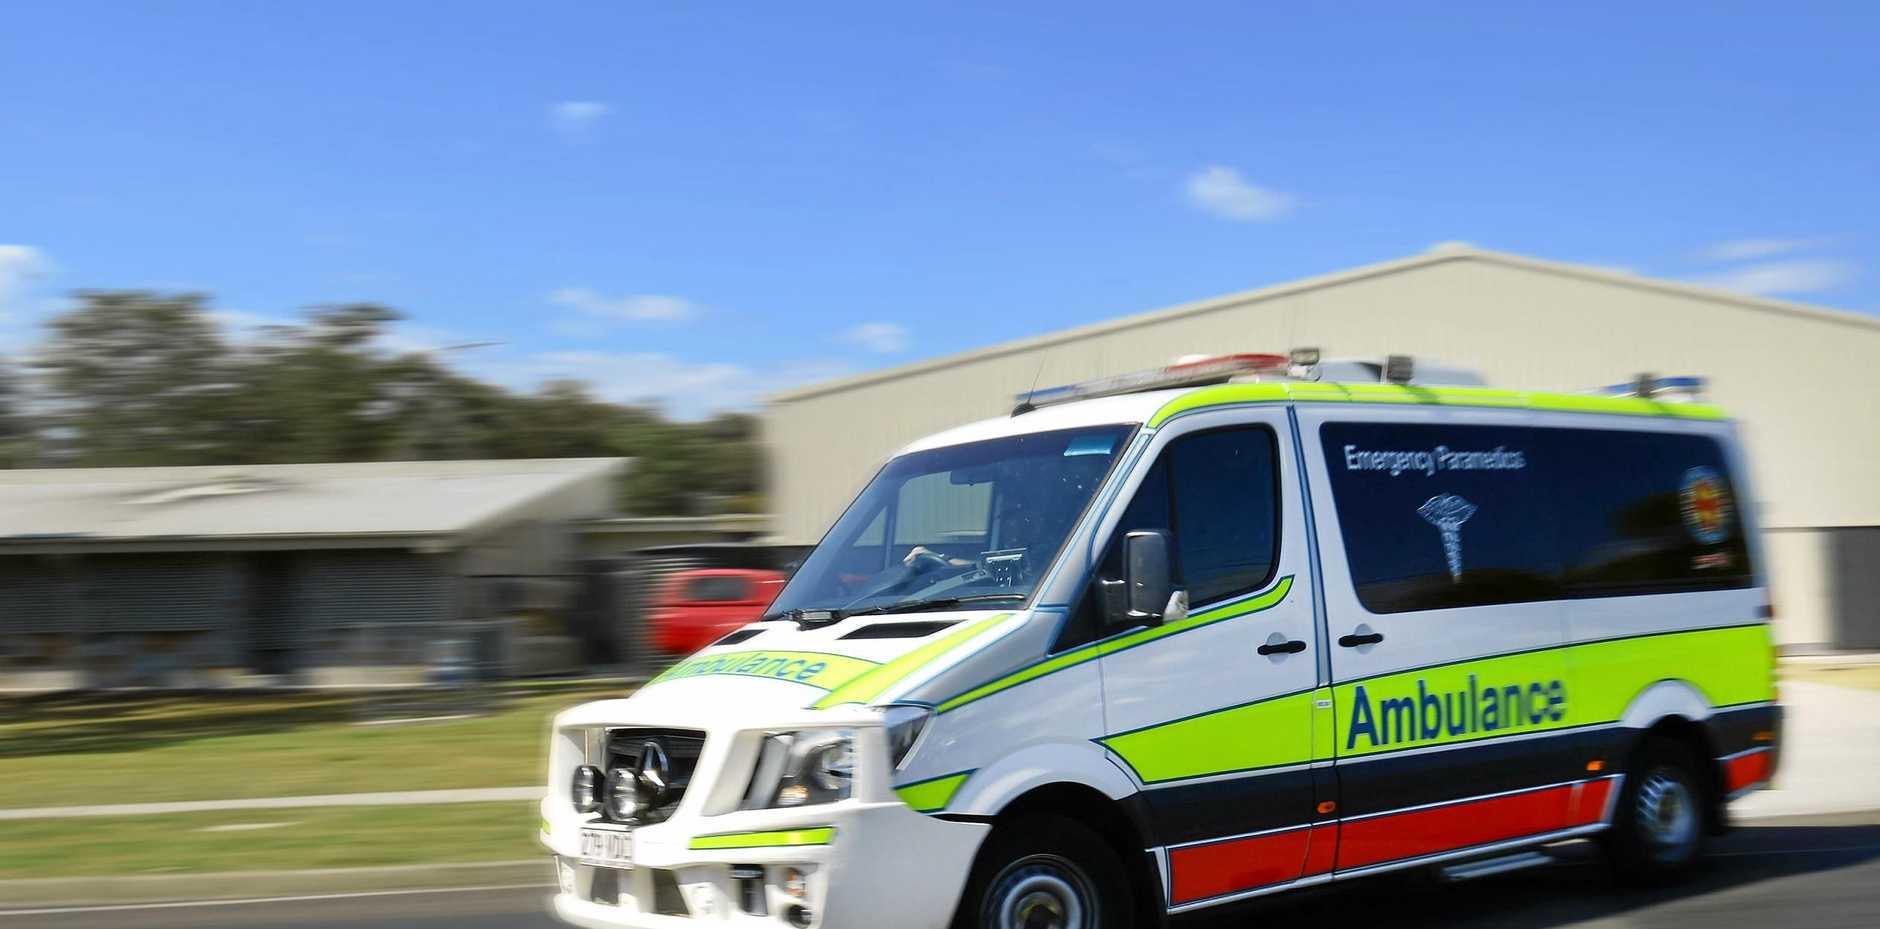 Queensland Ambulance Service was on scene.